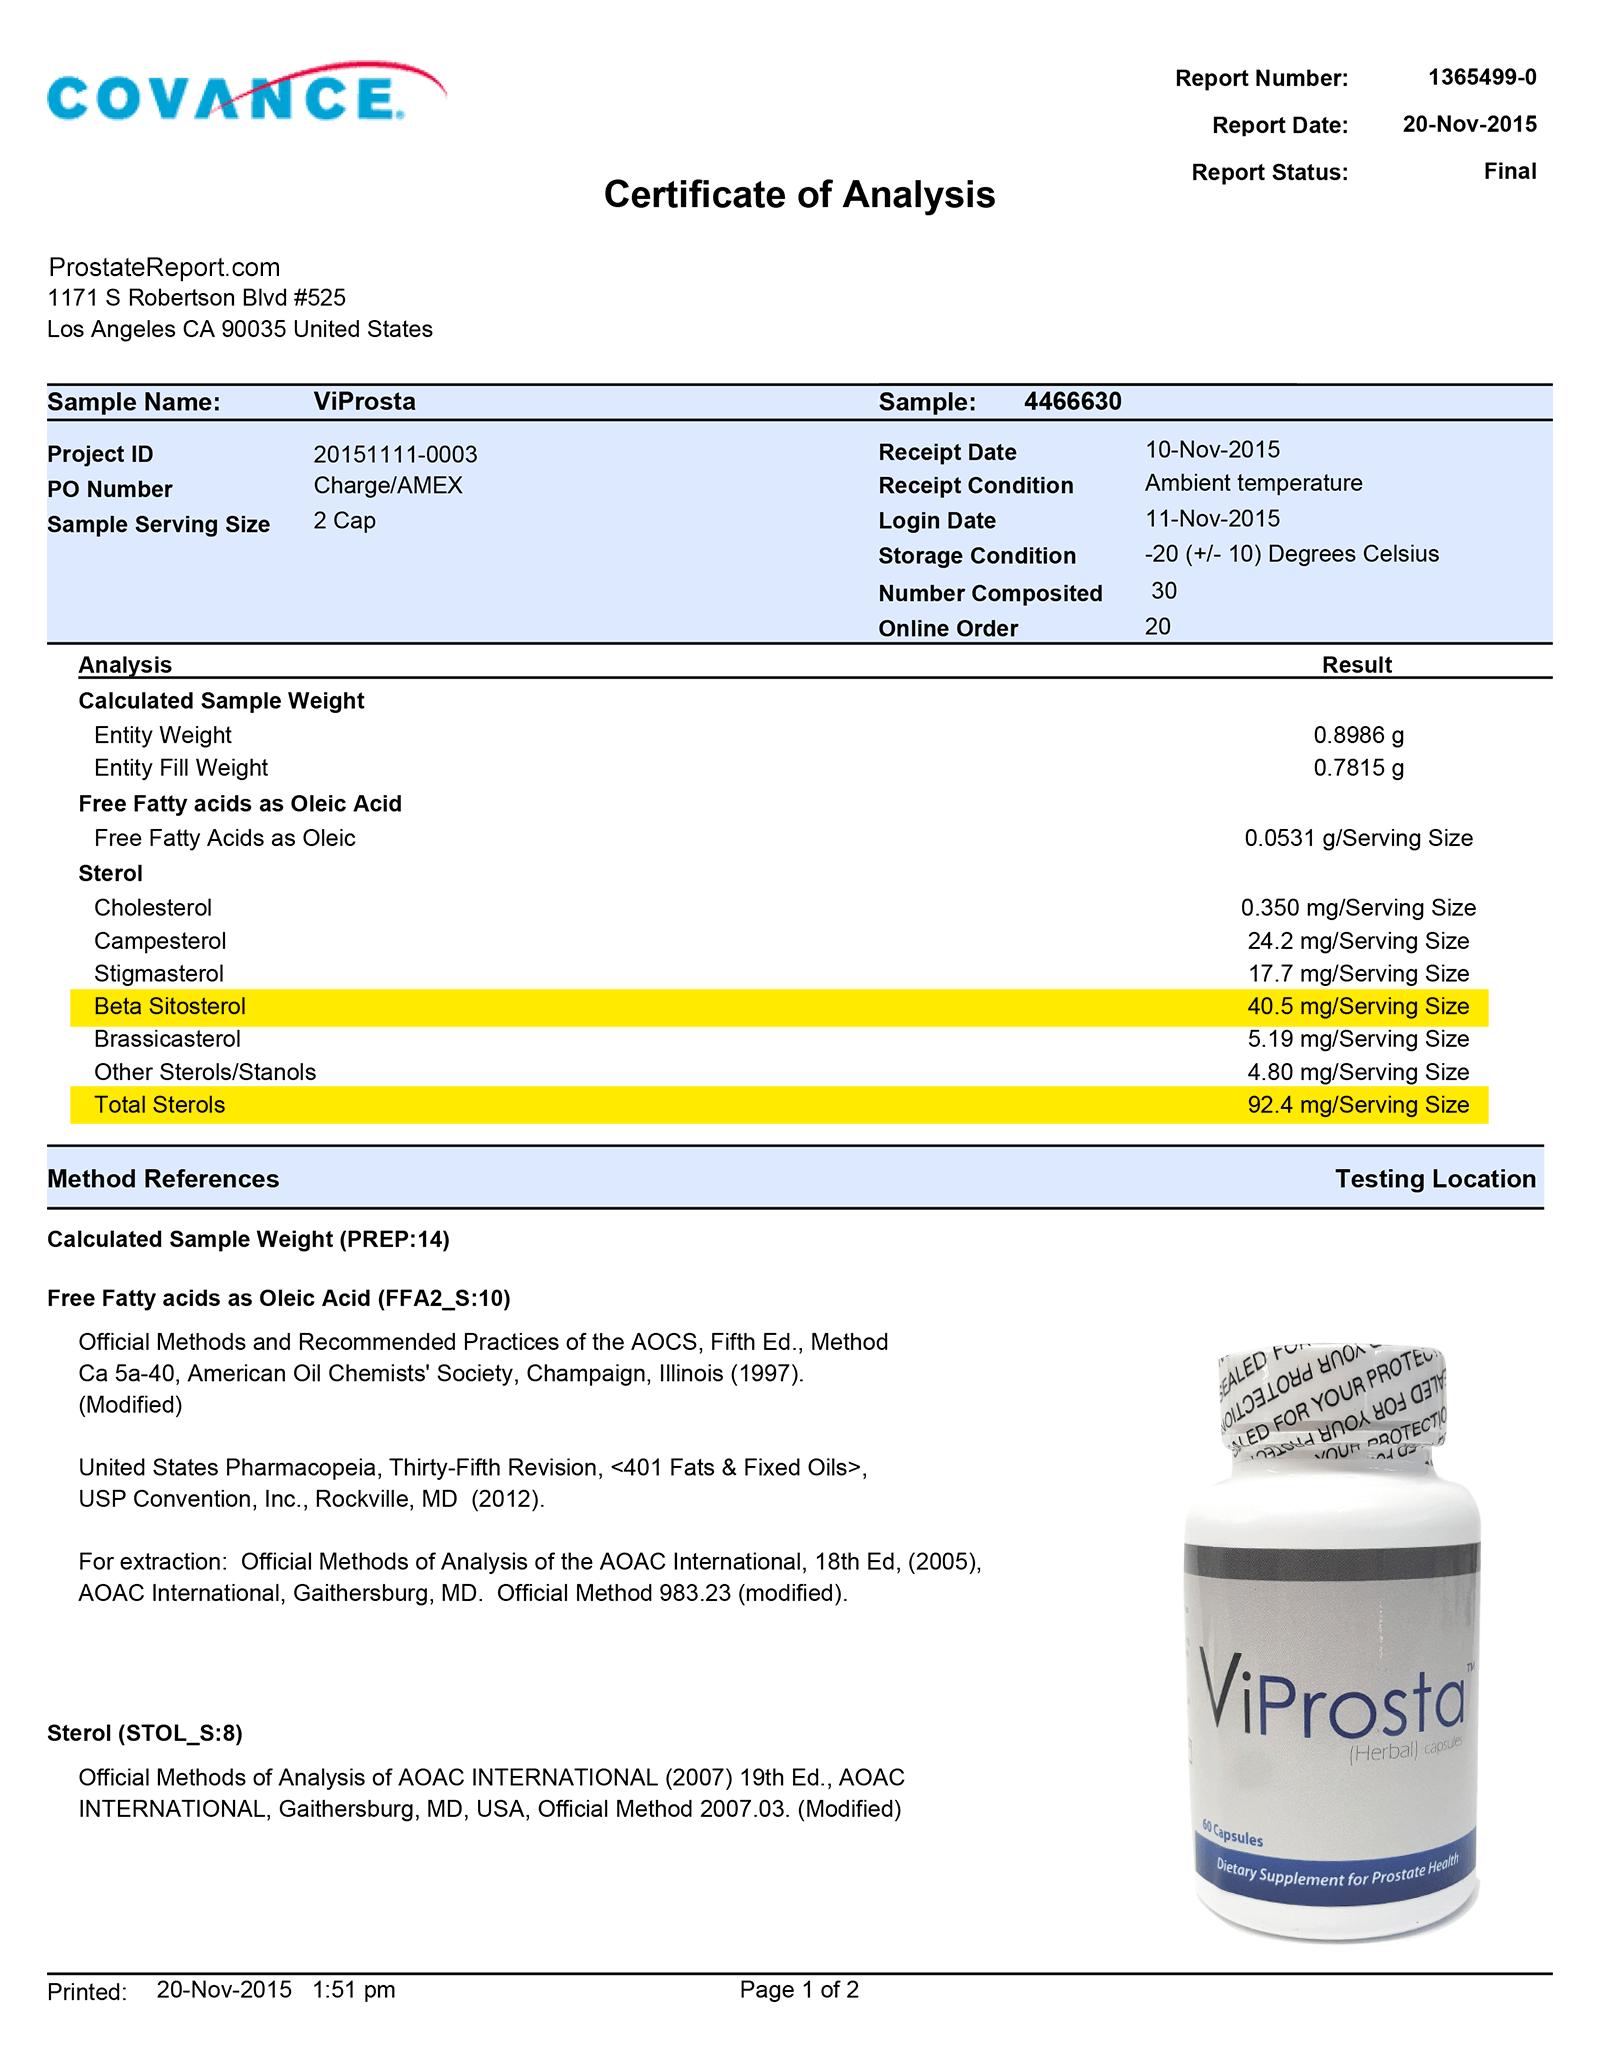 ViProsta lab report